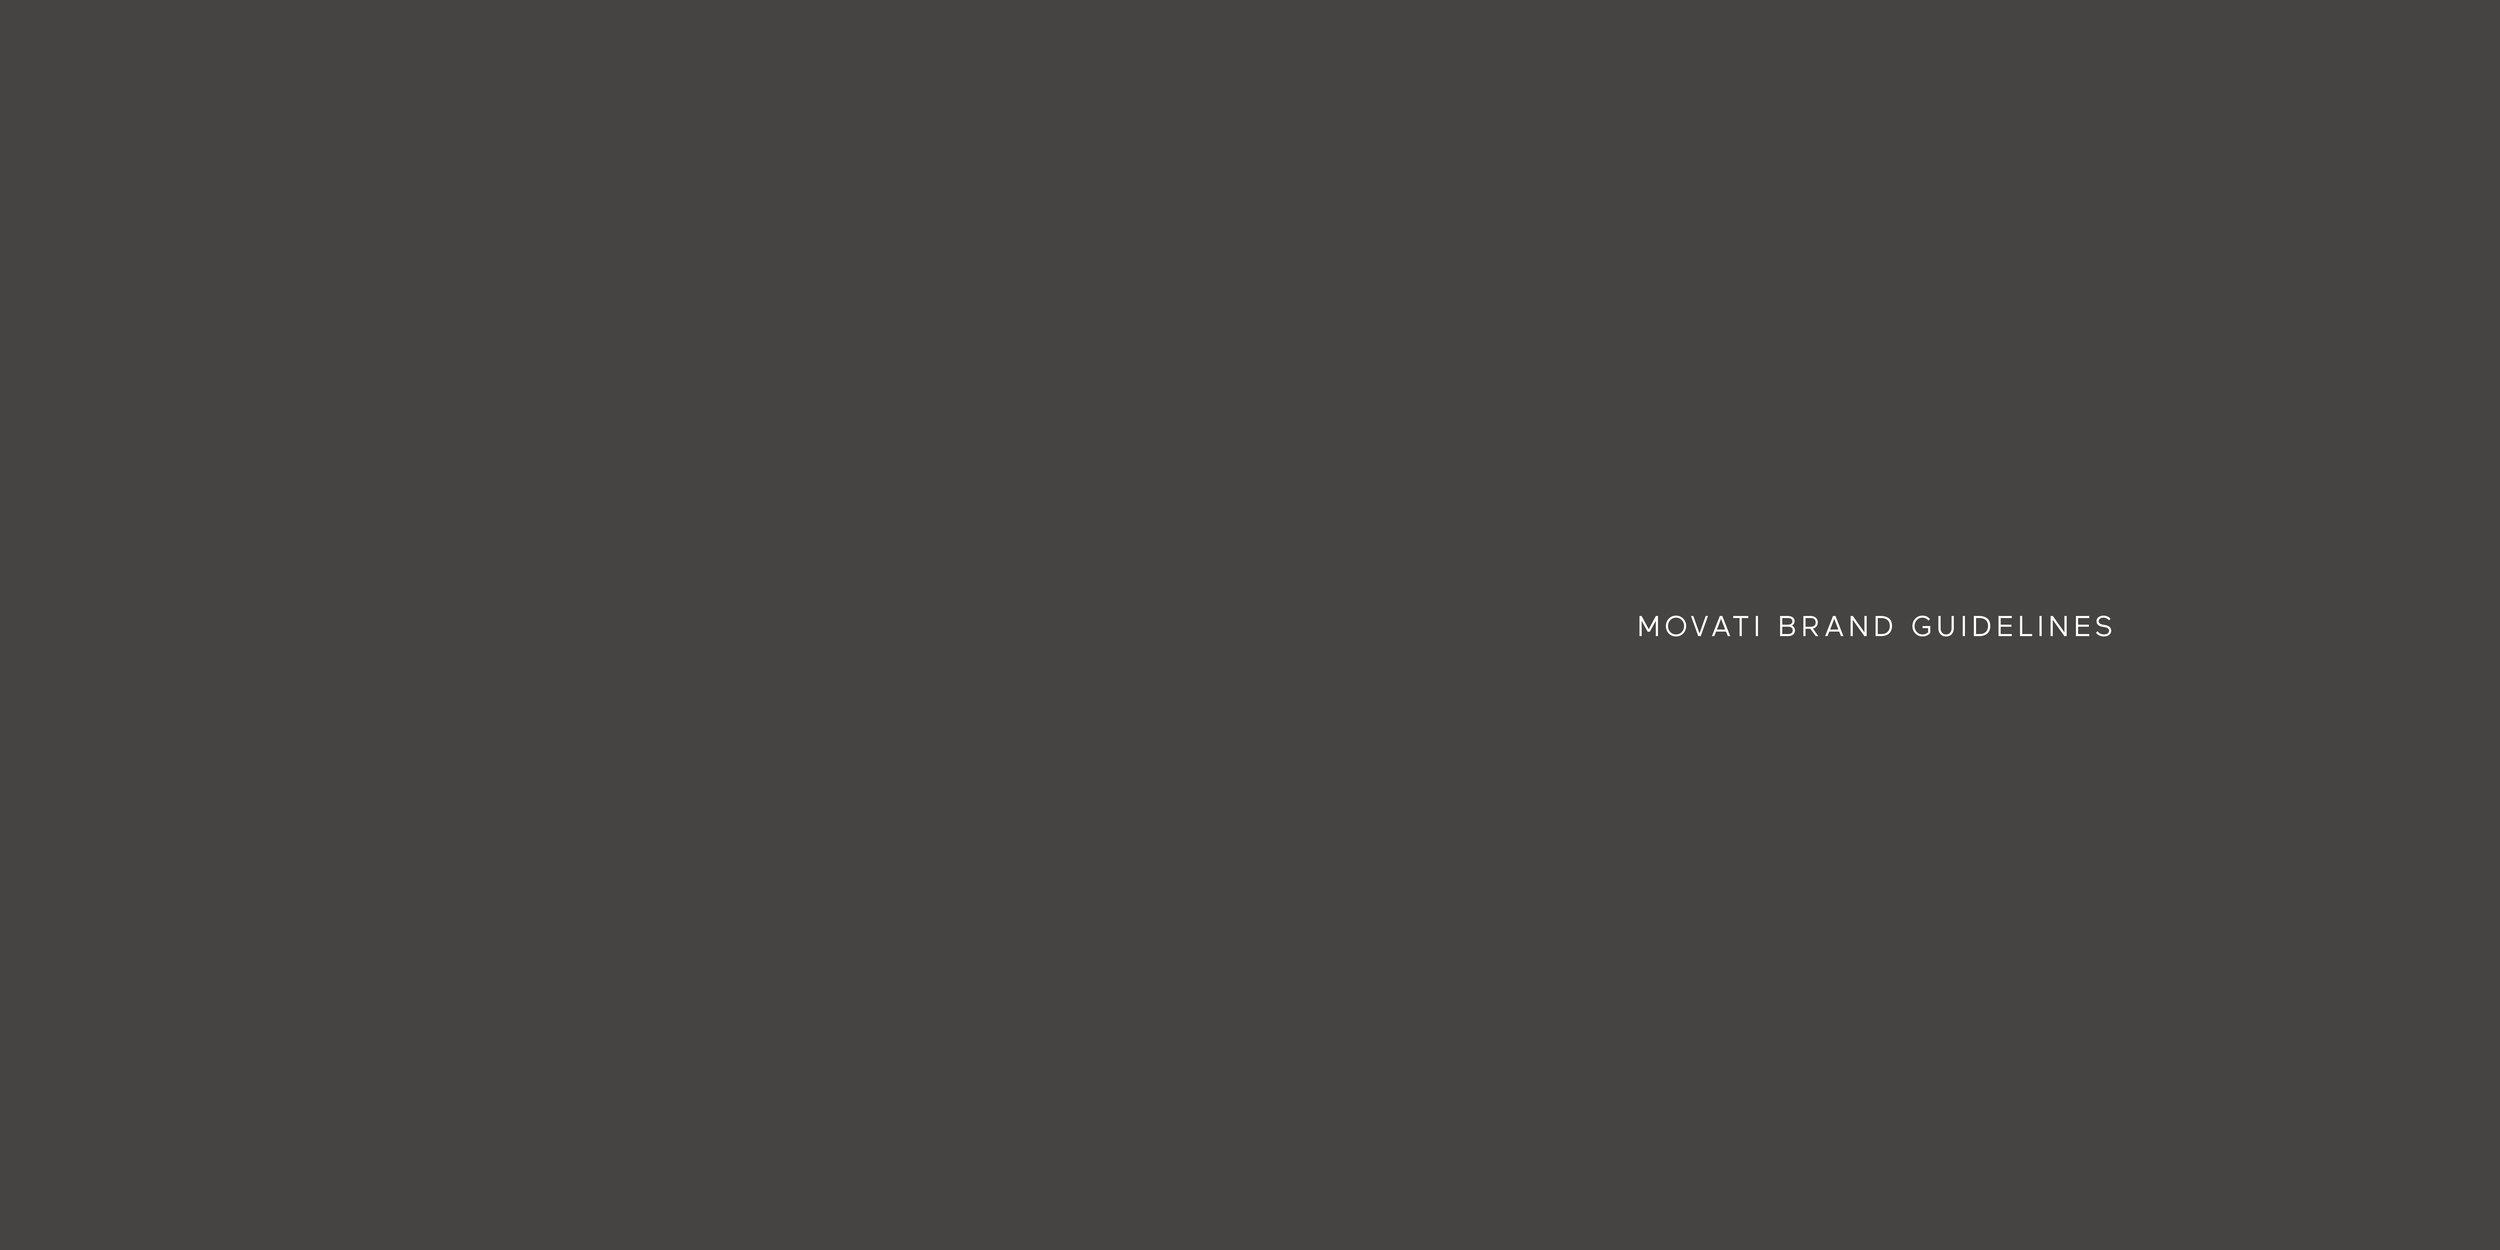 Movati_BrandGuidelines2.jpg